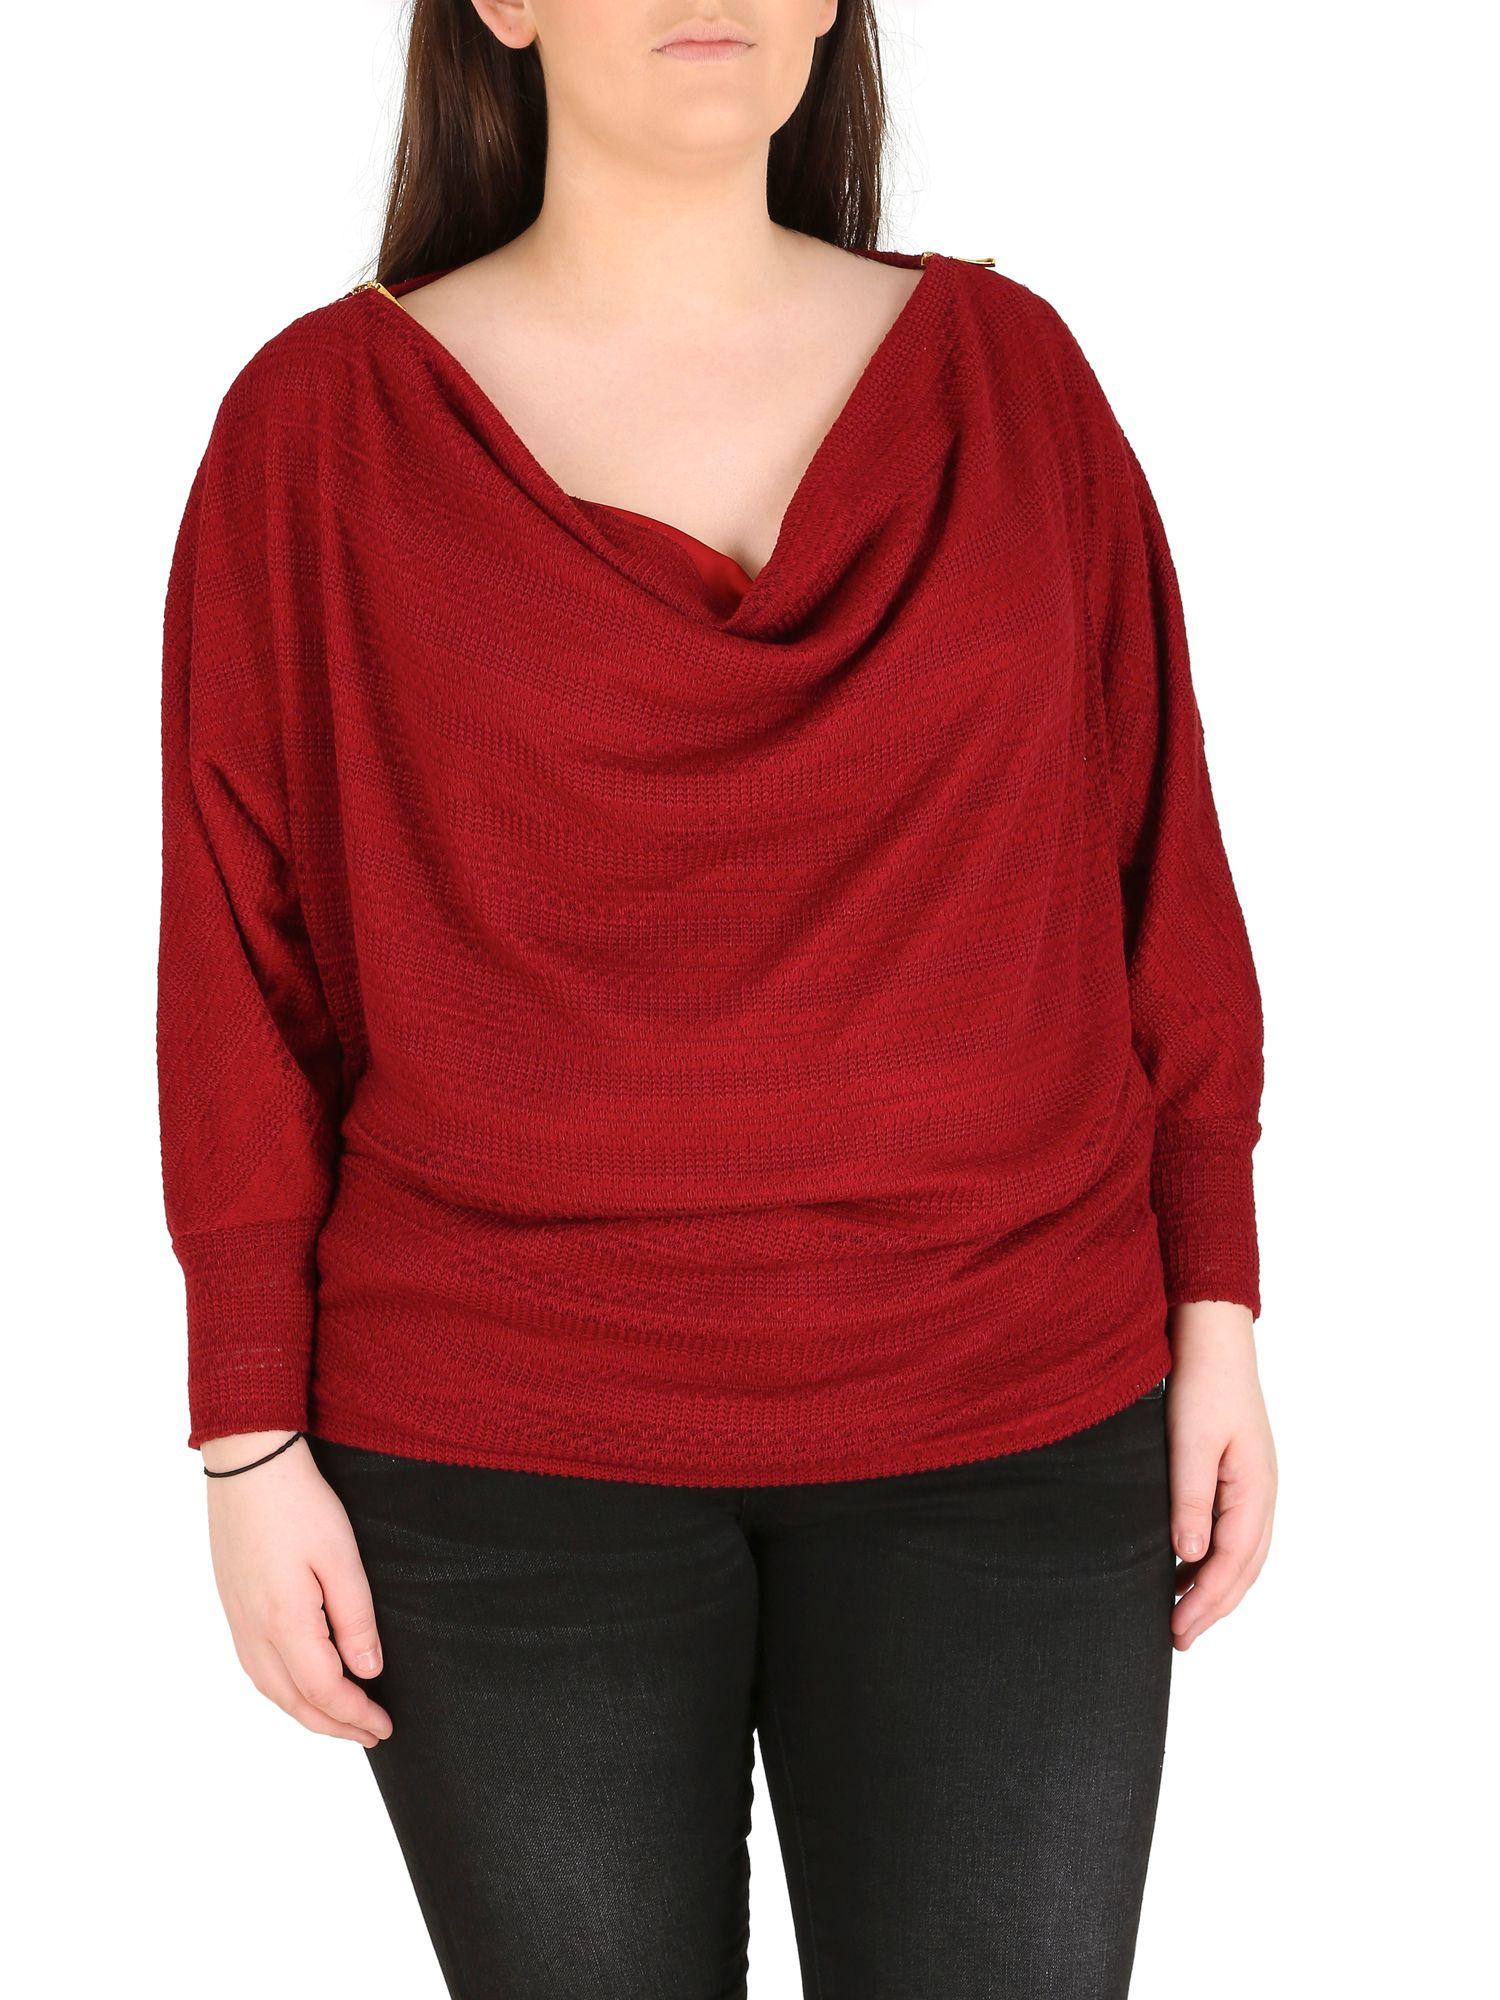 Samya polyester elastane cowl neck top in purple burgundy